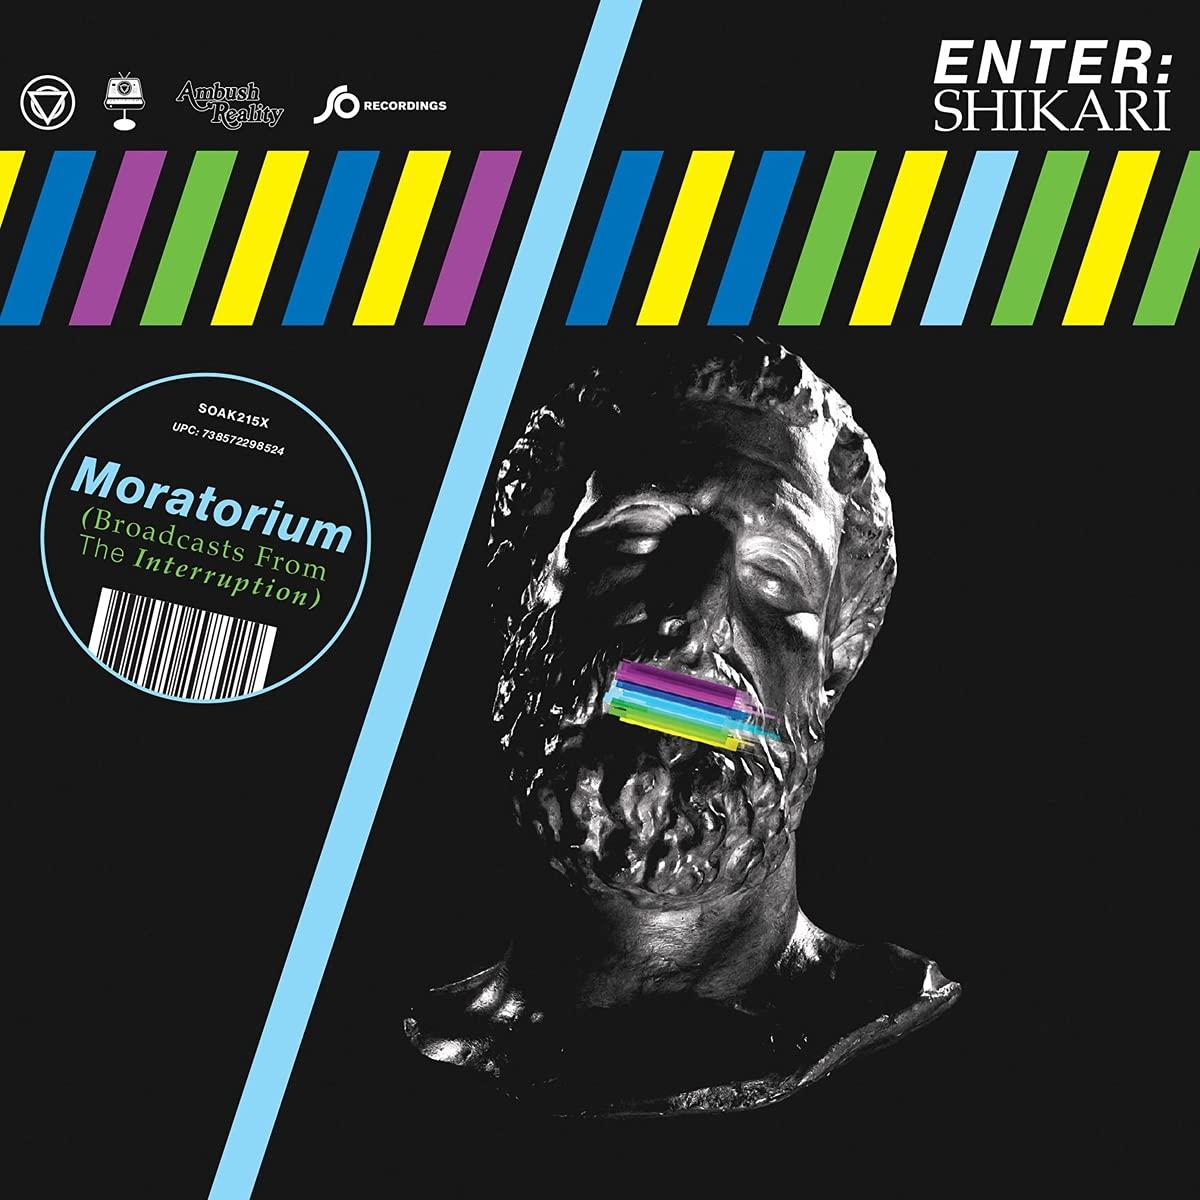 Enter Shikari - Moratorium (Broadcasts From The Interruption) (2021) [FLAC] Download